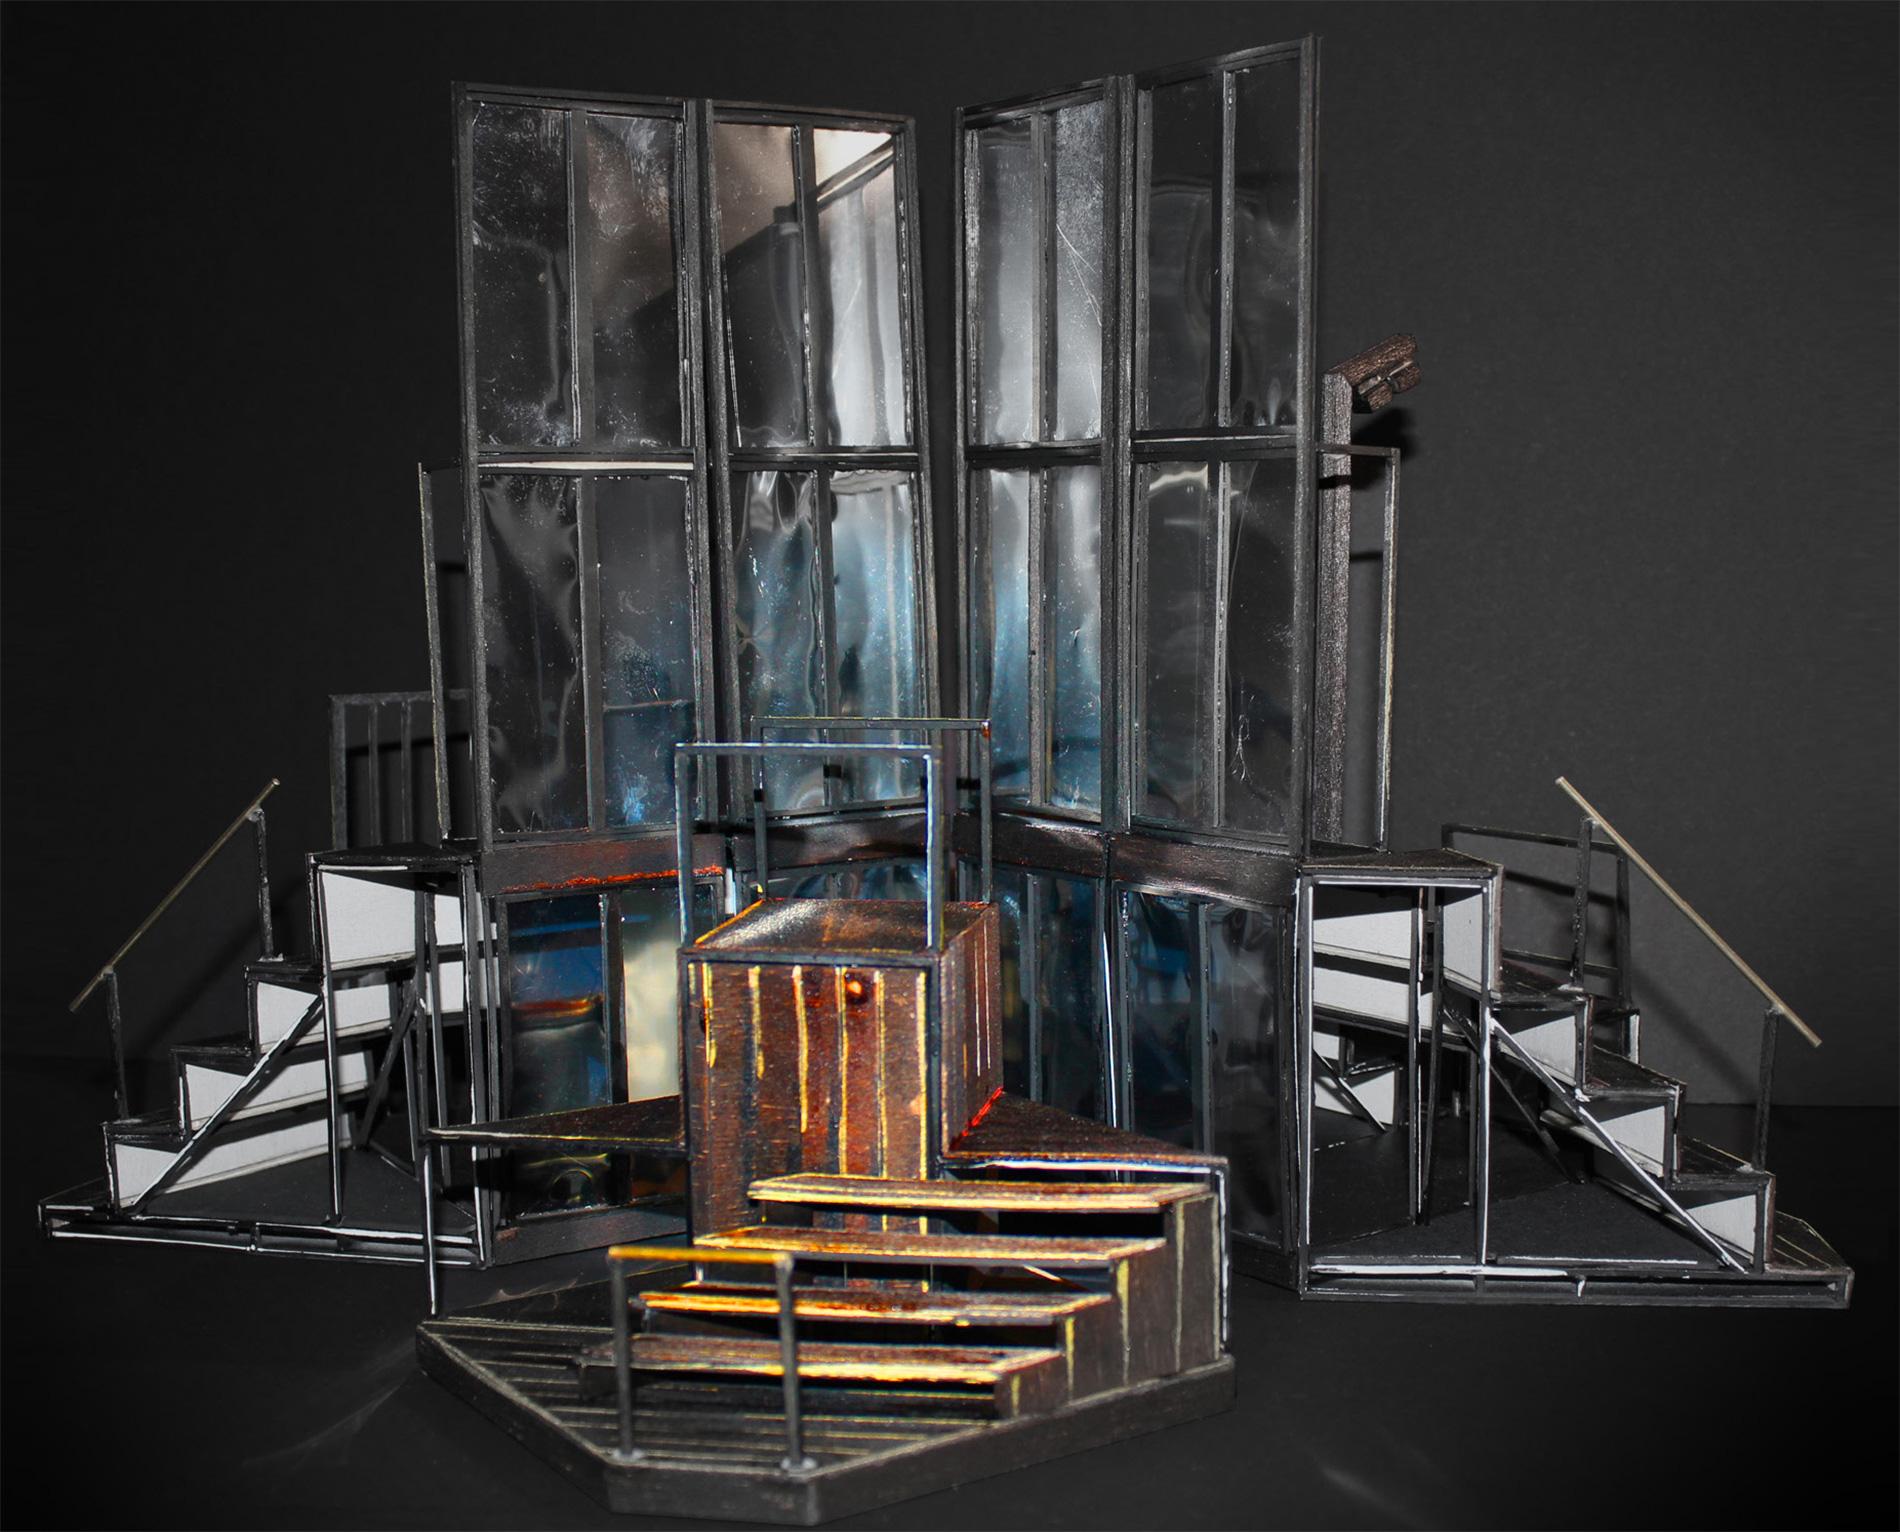 Tailleferre r seau canop for Decor de theatre